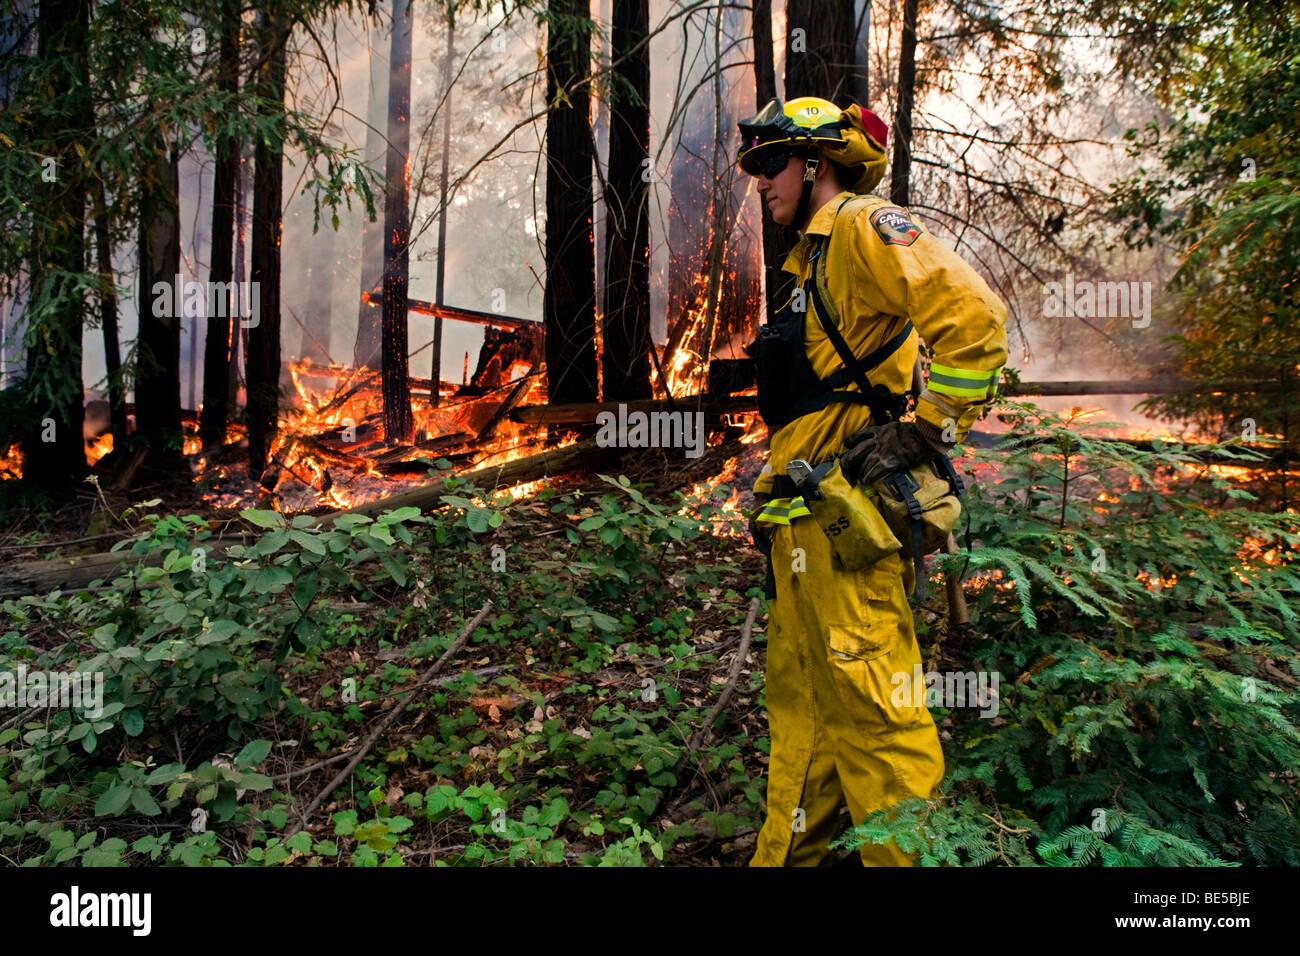 Wildland firefighters at California Lockheed wildfire in Santa Cruz Mountains. CALFIRE/CDF - Stock Image